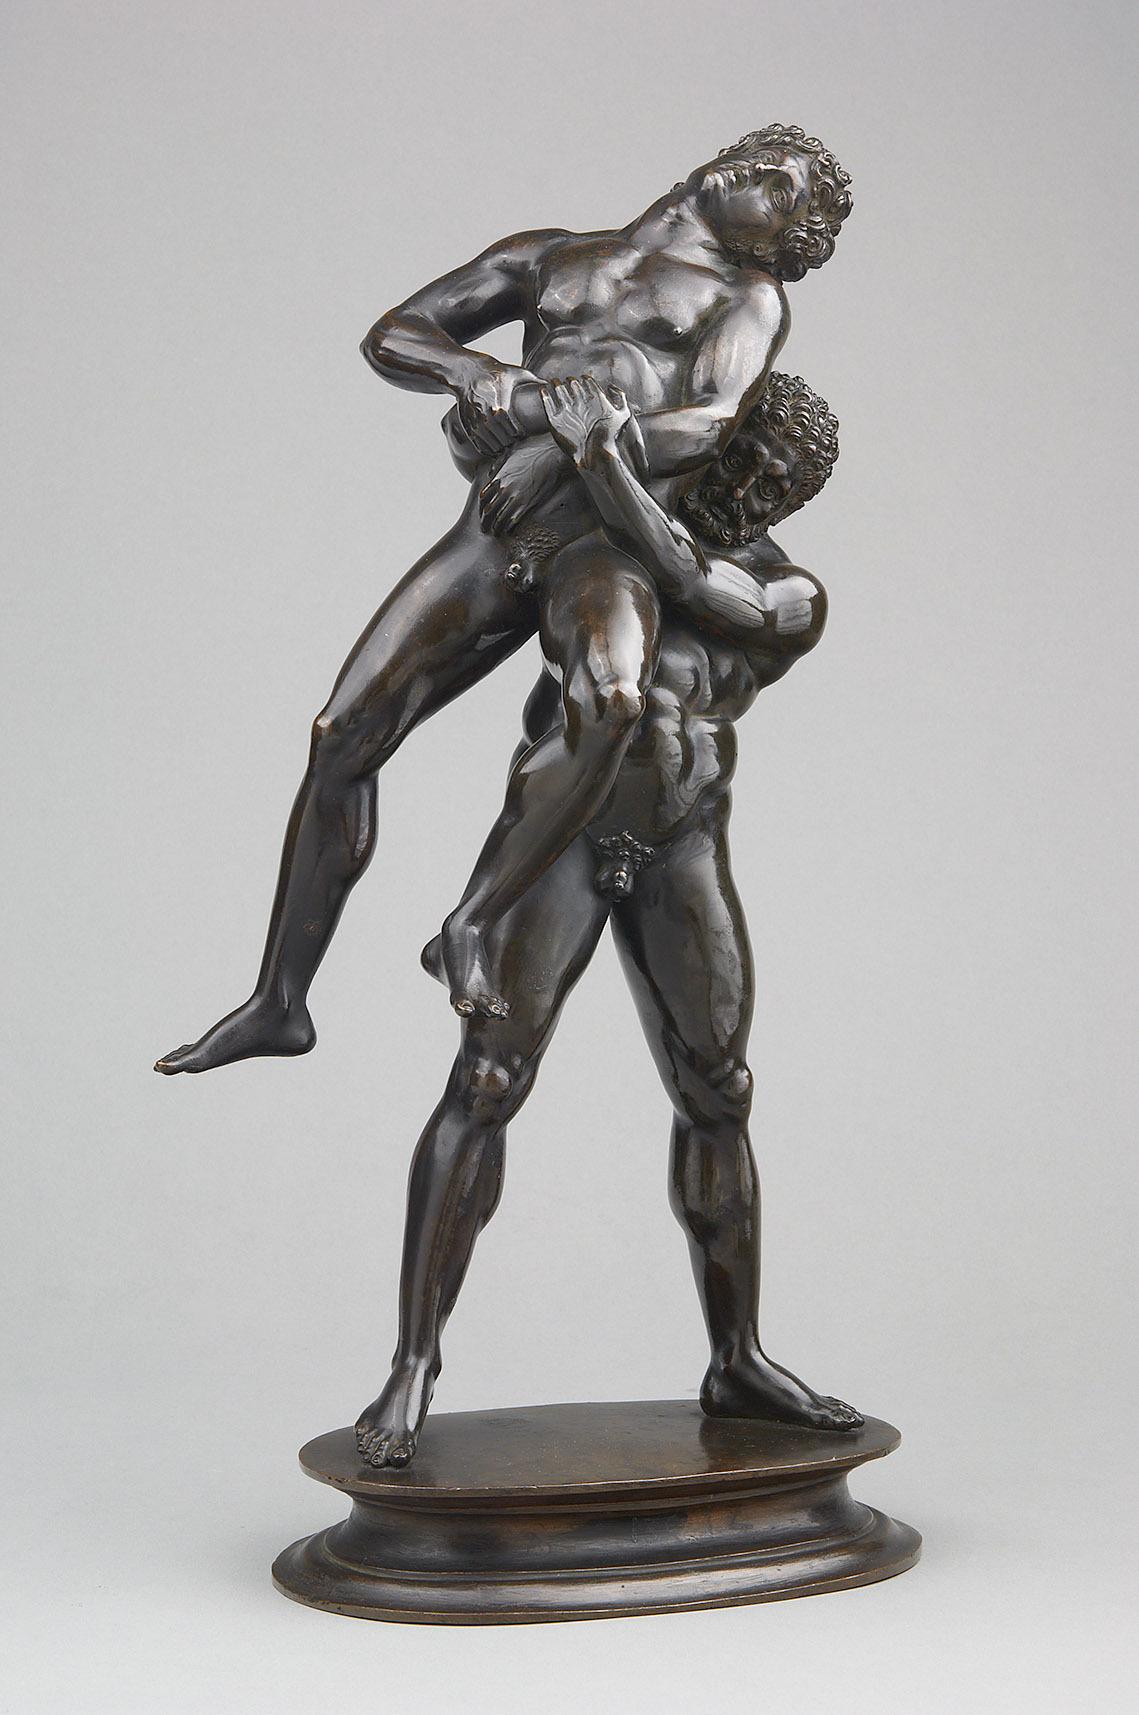 Herkules und Antäus von Pier Jacopo Alari de Bonacolsi, gen. Antico